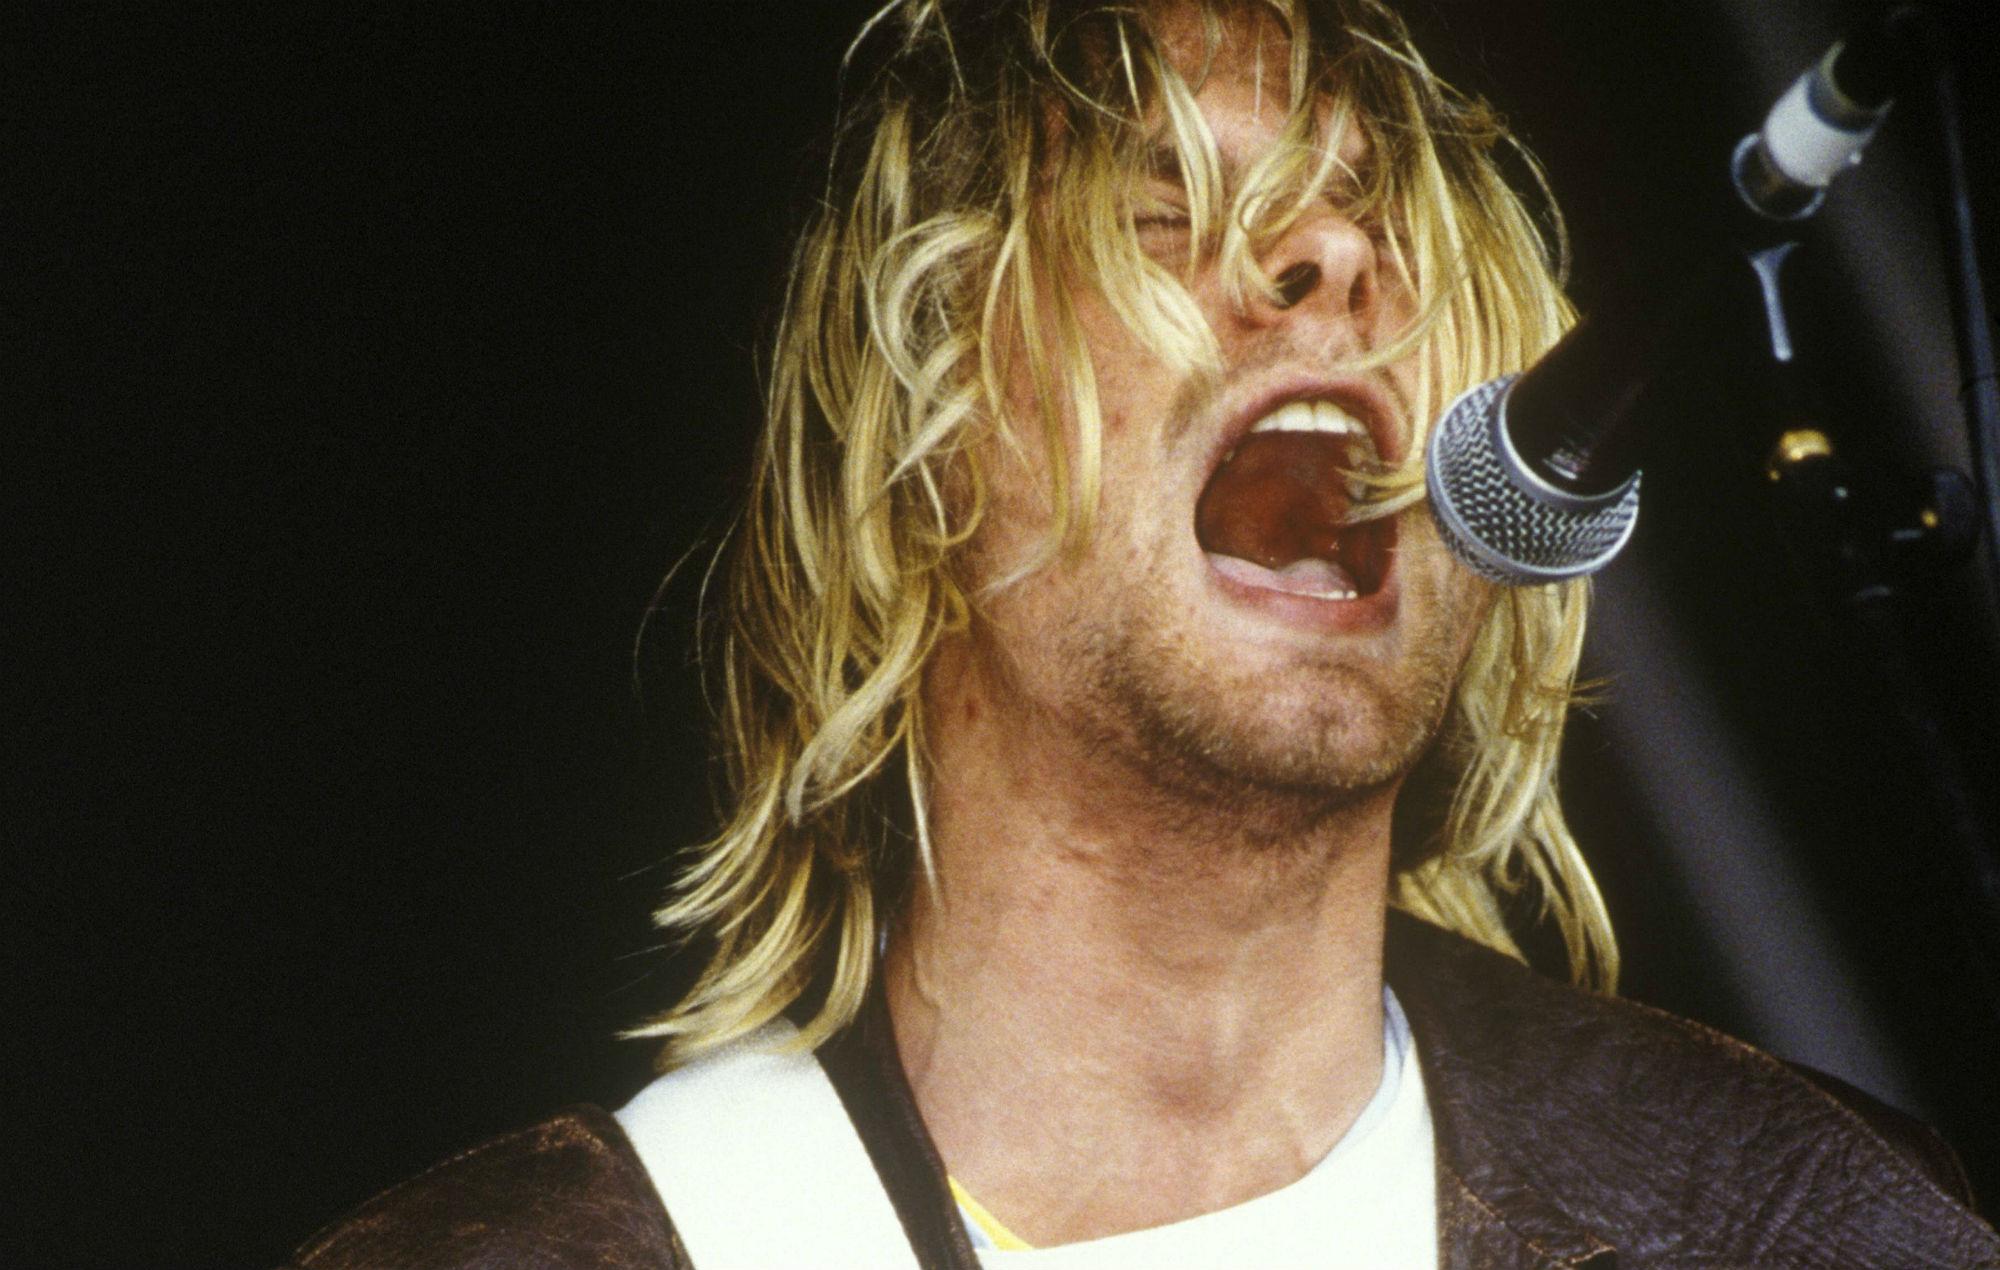 Musician repurposes Nirvana's 'Stay Away' for 'Stay Inside!' coronavirus advice song – watch - EpicNews